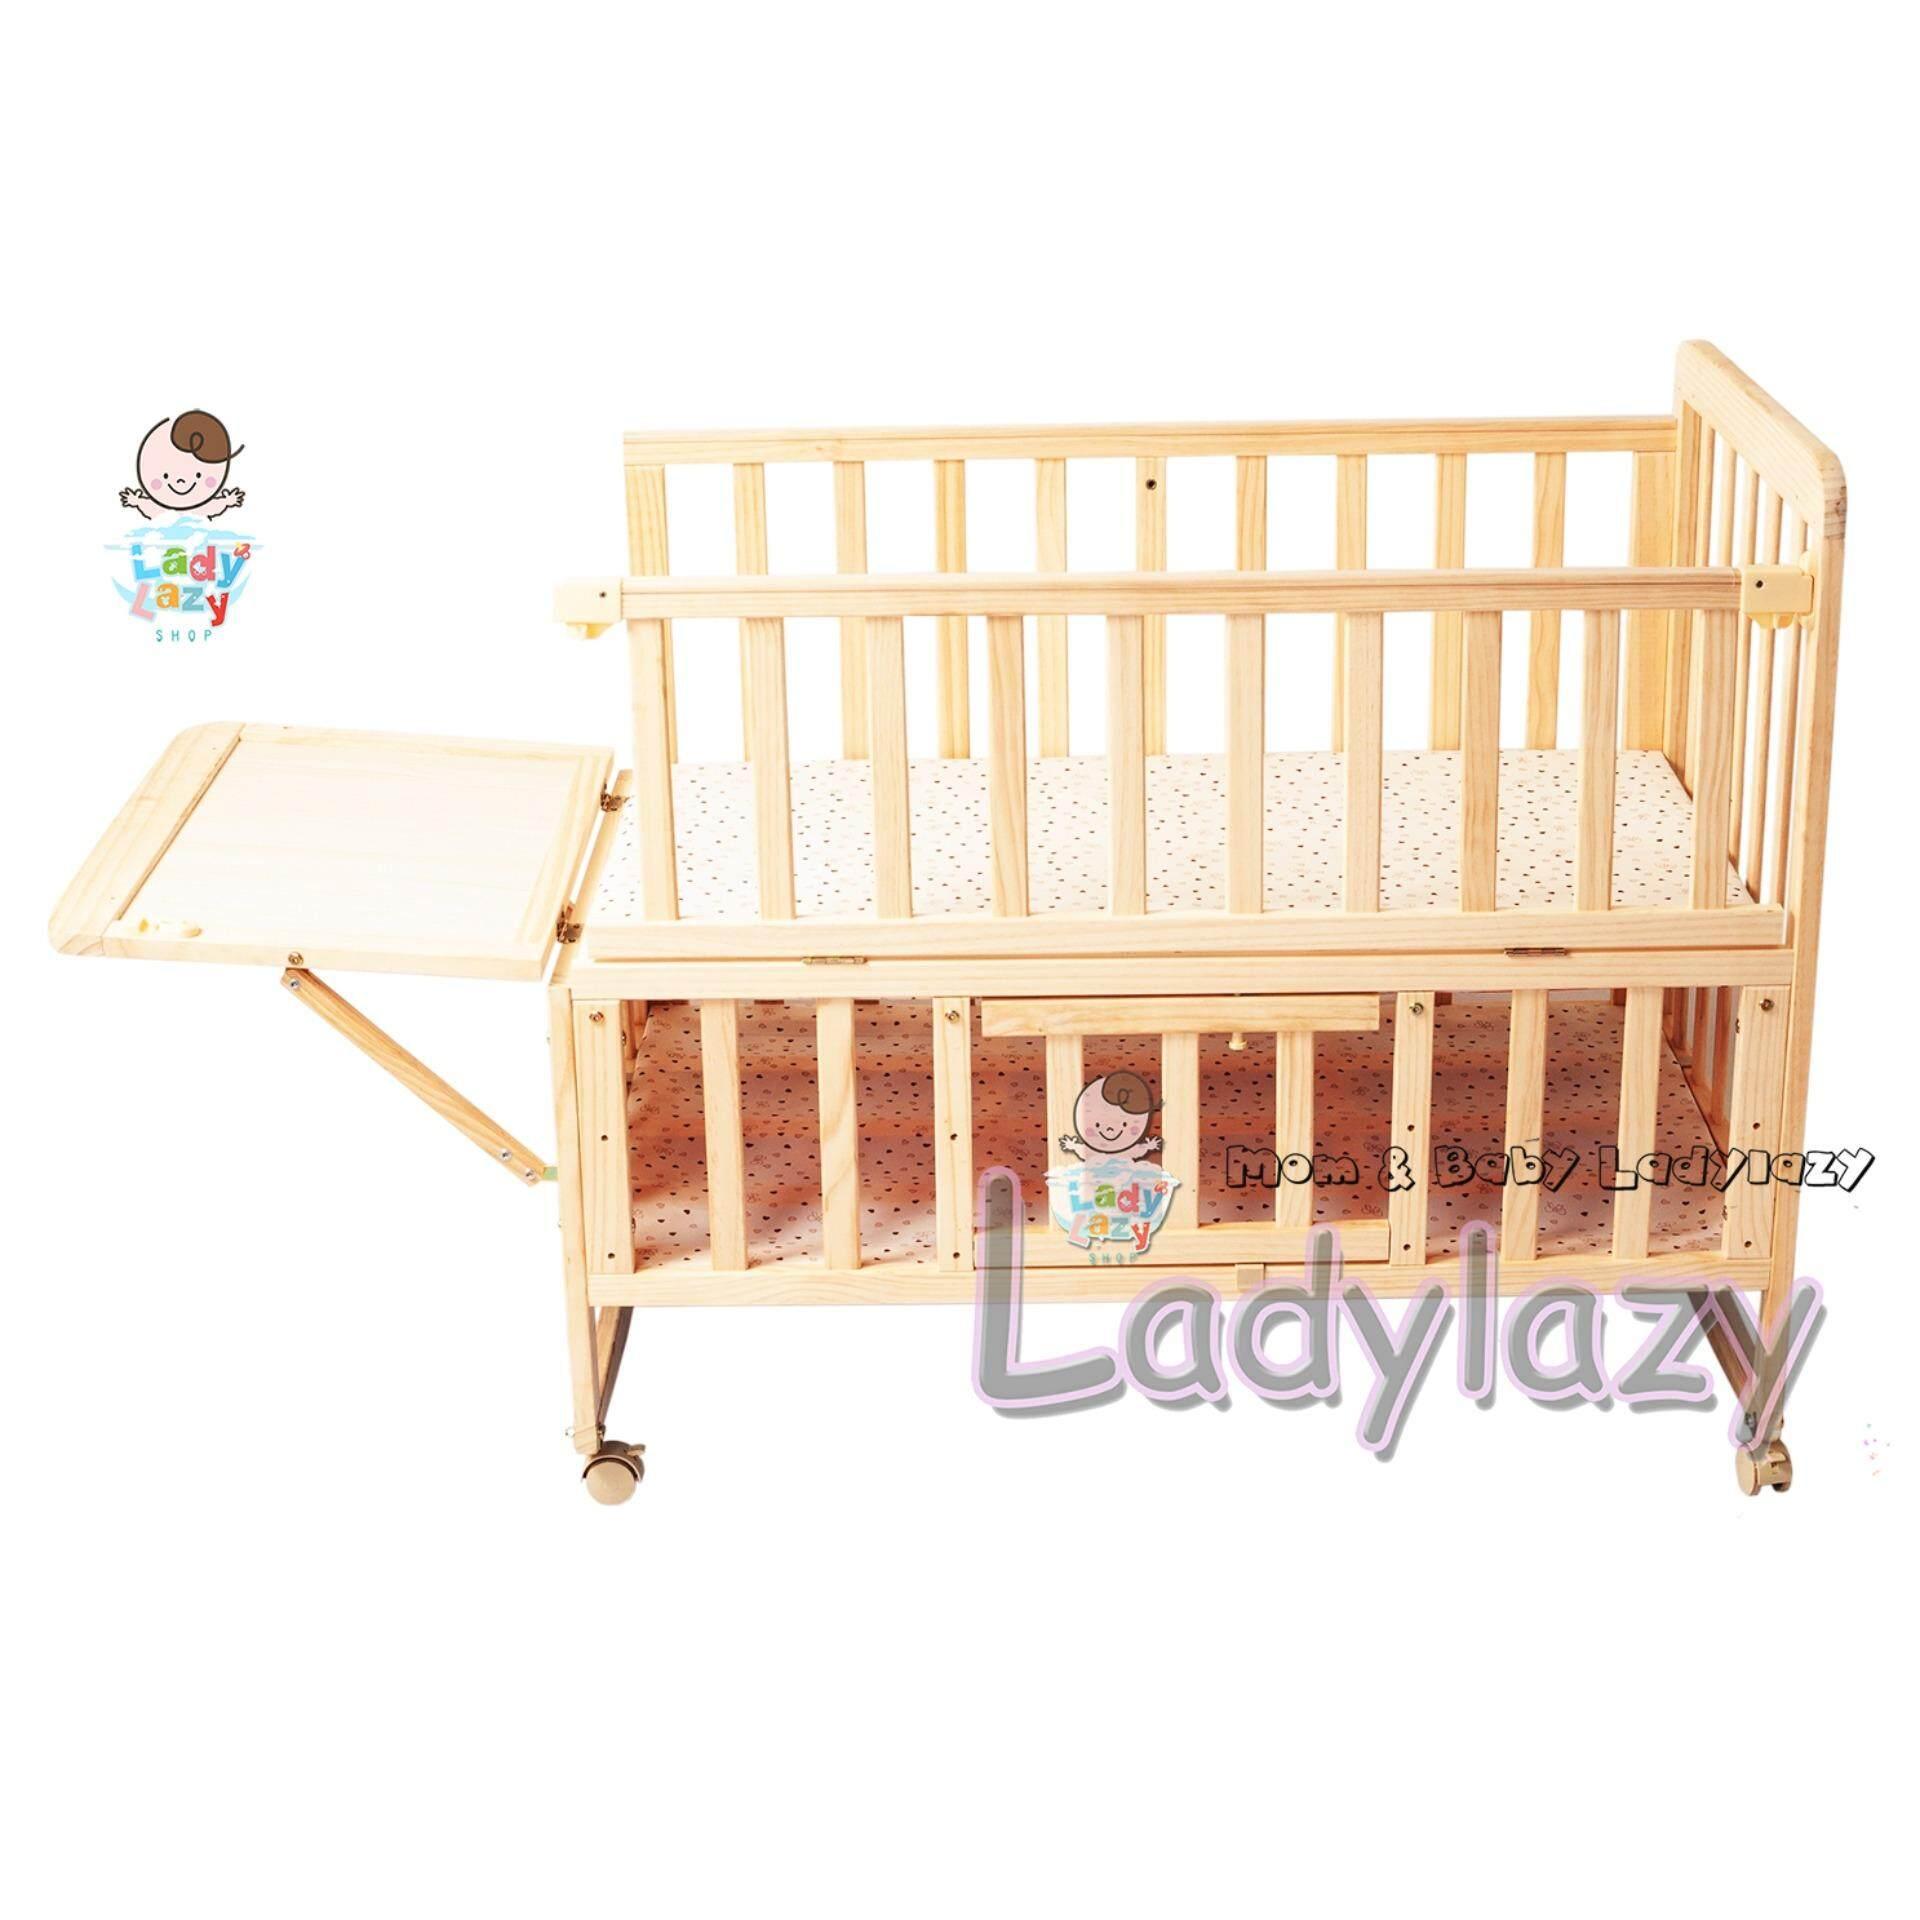 Ladylazyเตียงเด็ก เตียงนอนไม้เด็ก เข็นได้/โยกได้ พื้นเตียงปรับระดับได้ ทำจากไม้สนแท้ 100% By Ladylazy.